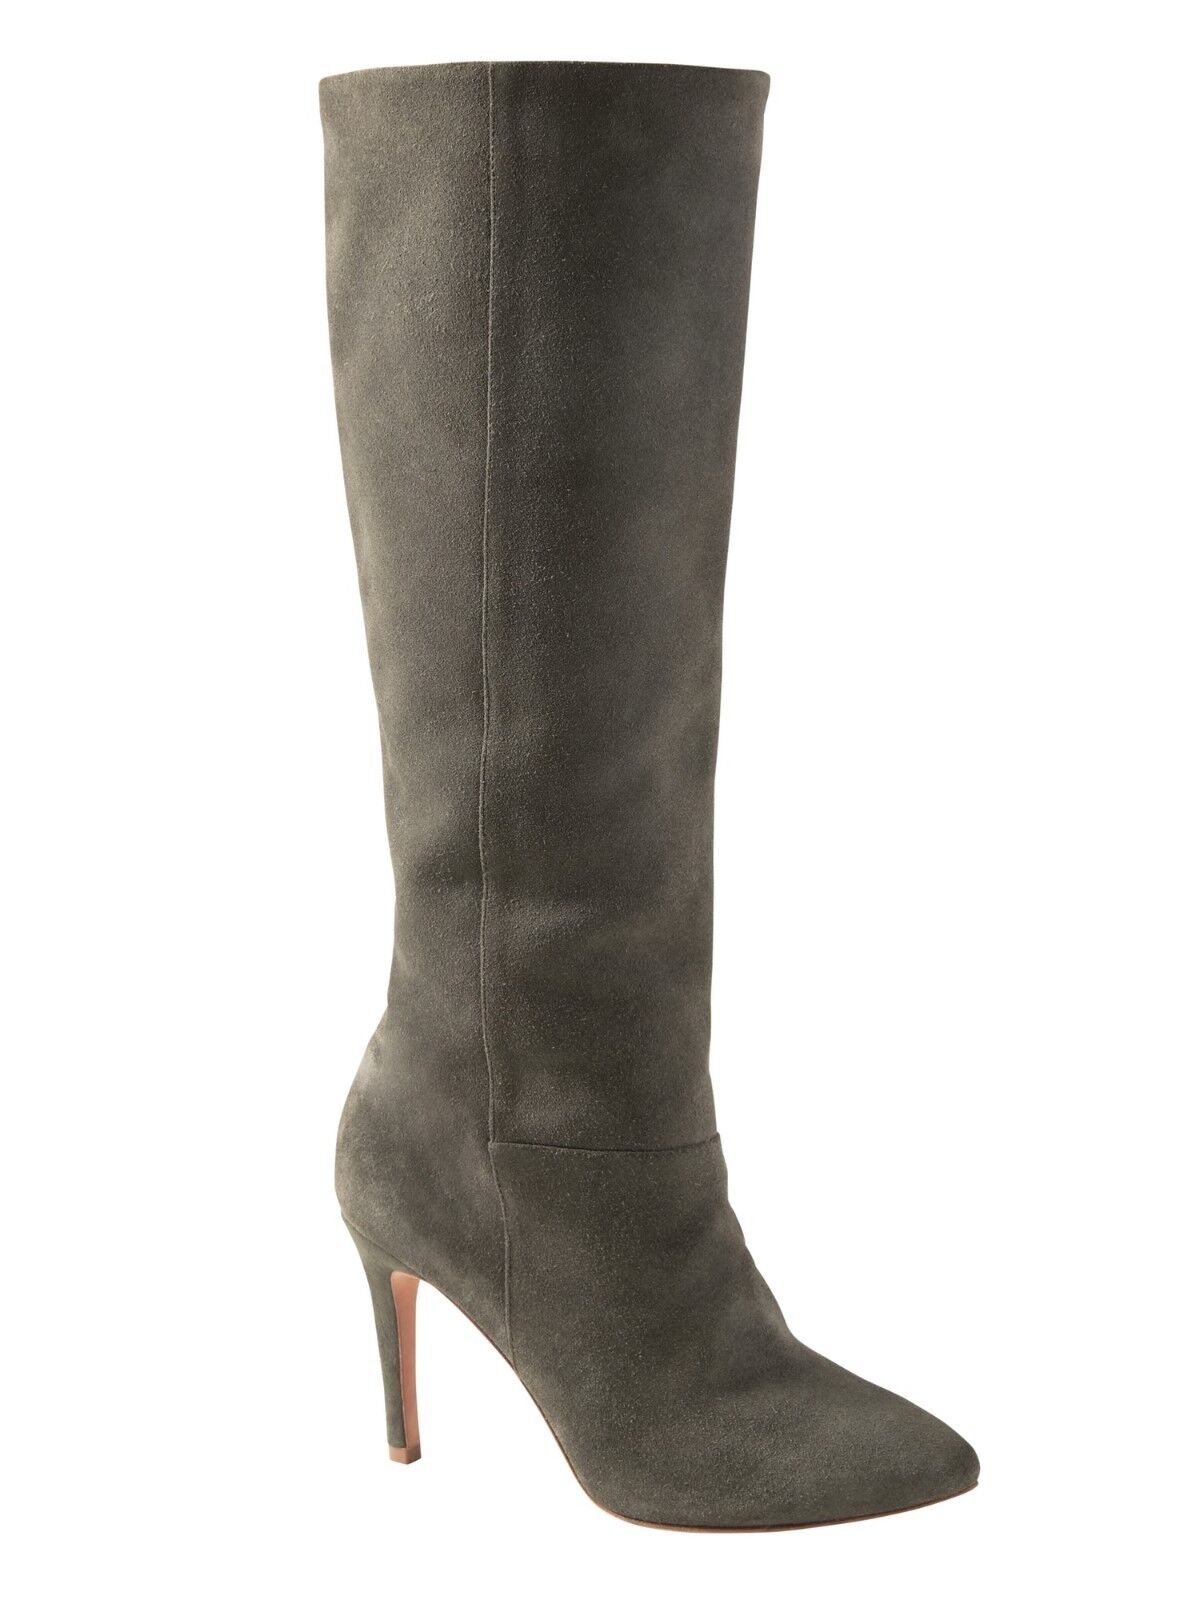 Joie | Jabre Boot Size 37 Color: Olive